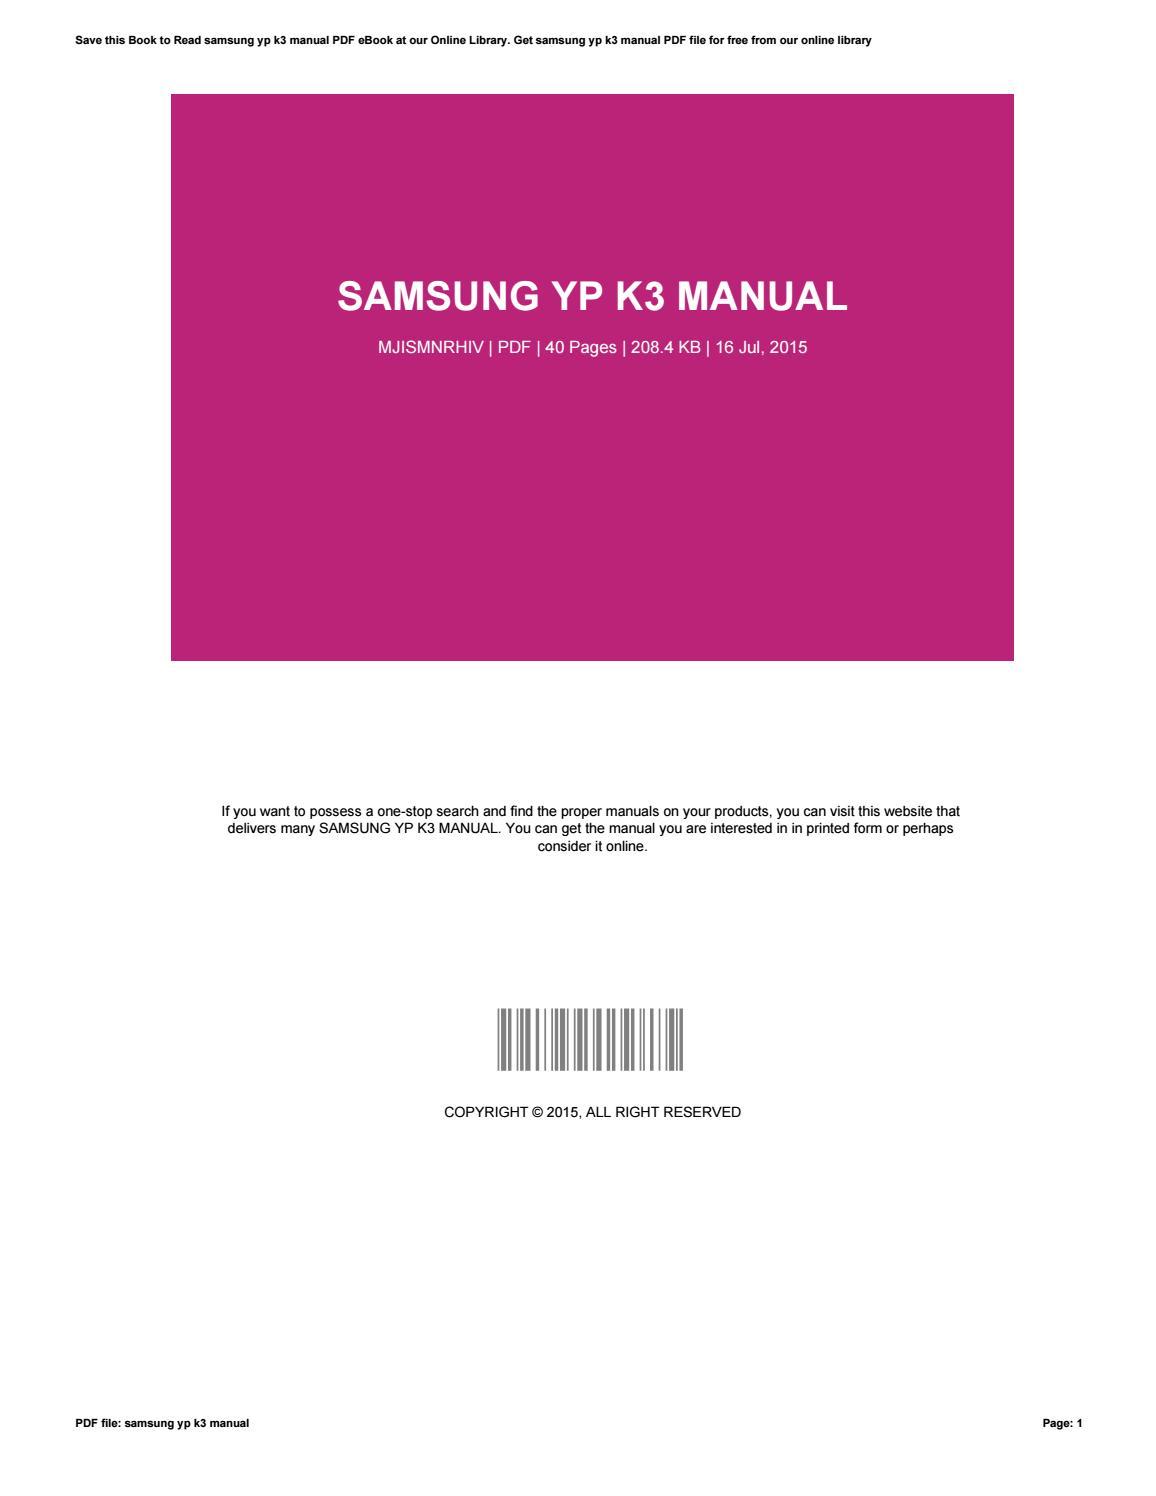 Samsung yp-k3-user-manual.